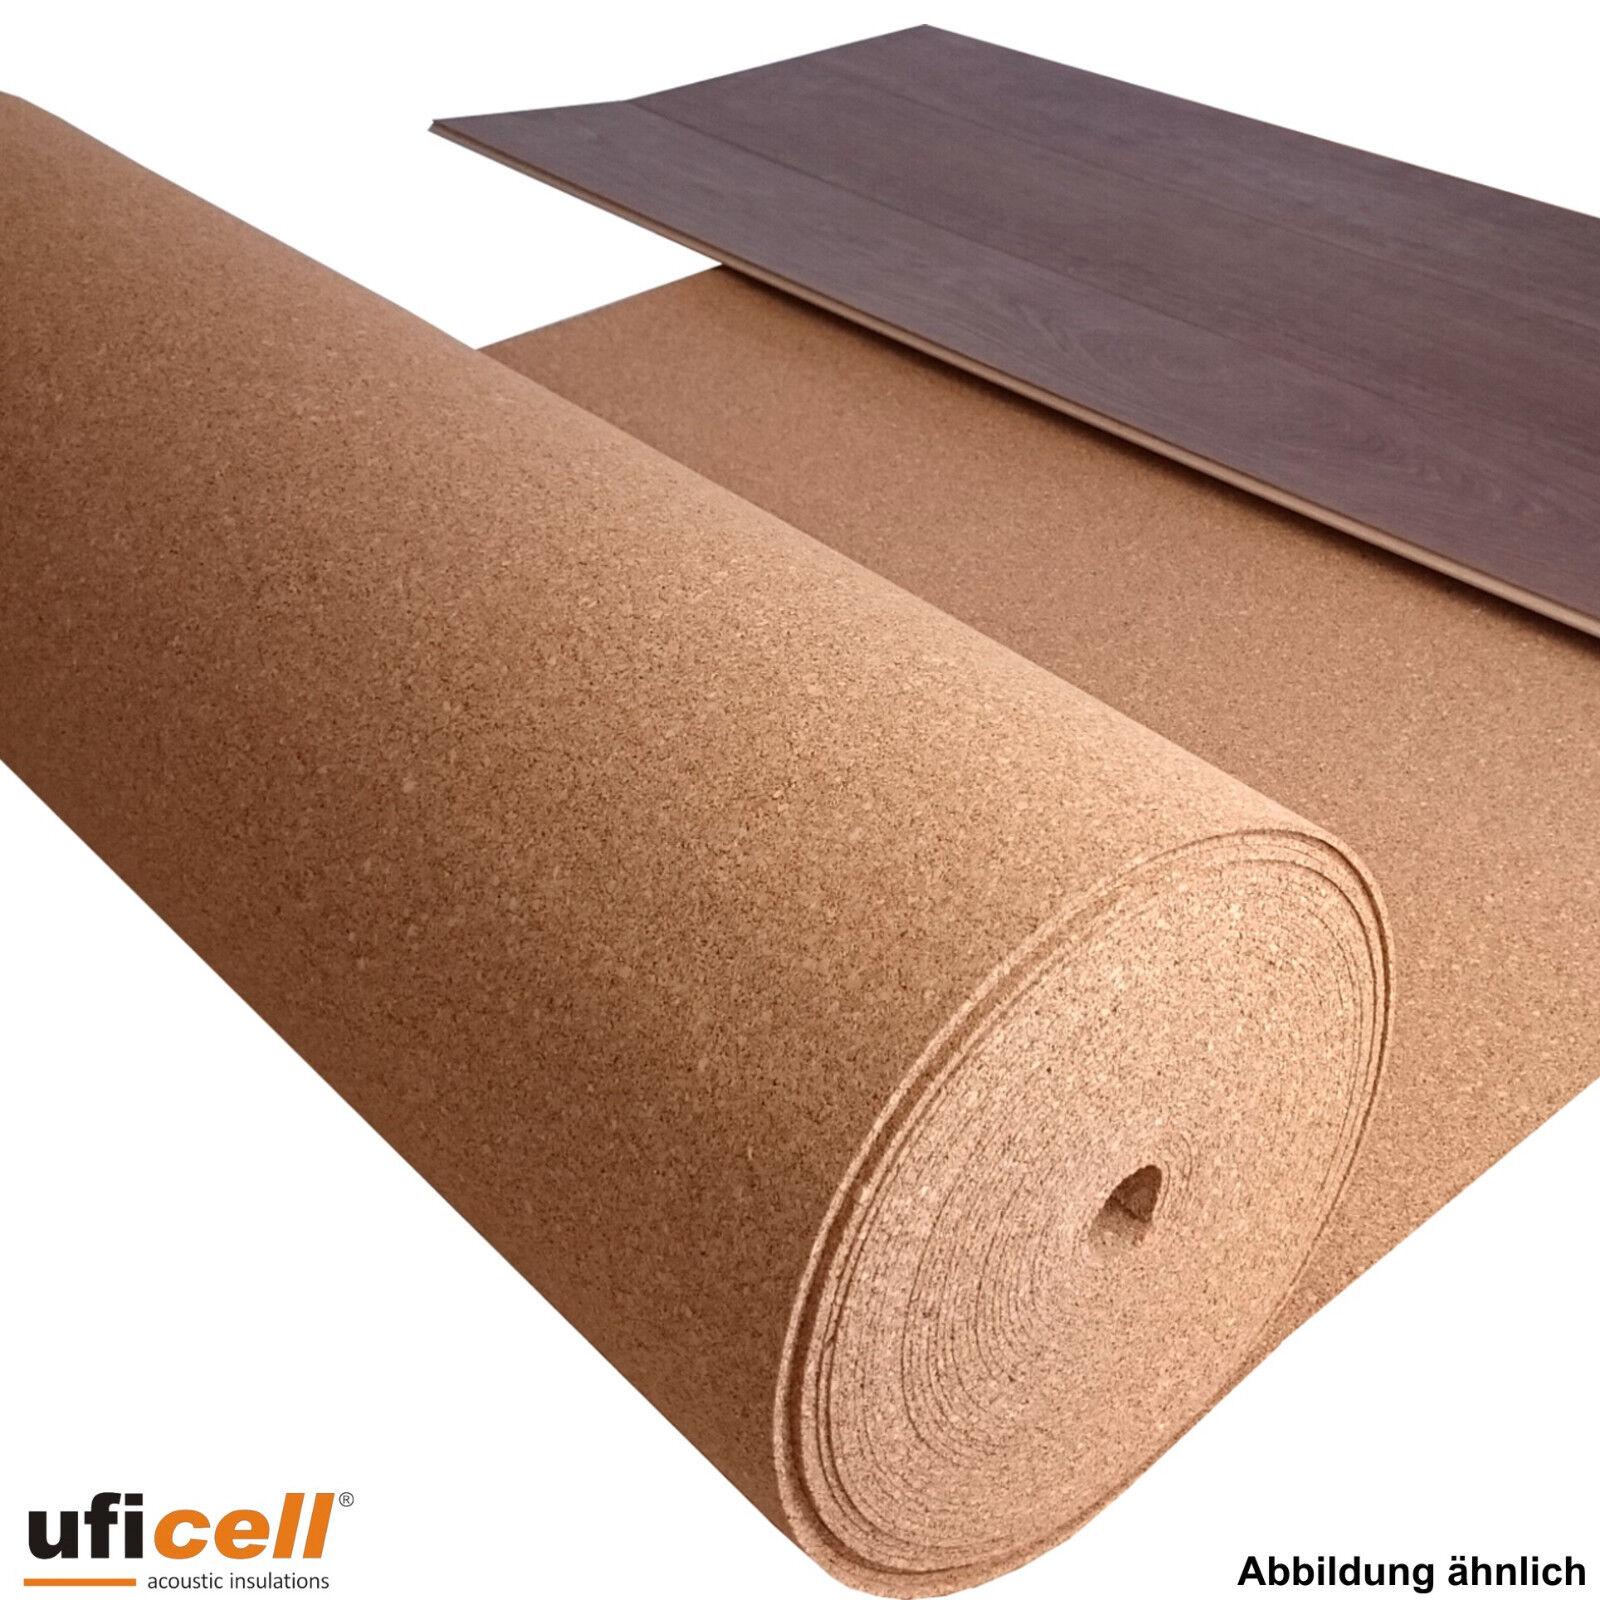 Uficell Rollenkork Trittschalldämmung Stärke 2-10 mm Stärke - 17 bis 22 dB(A)